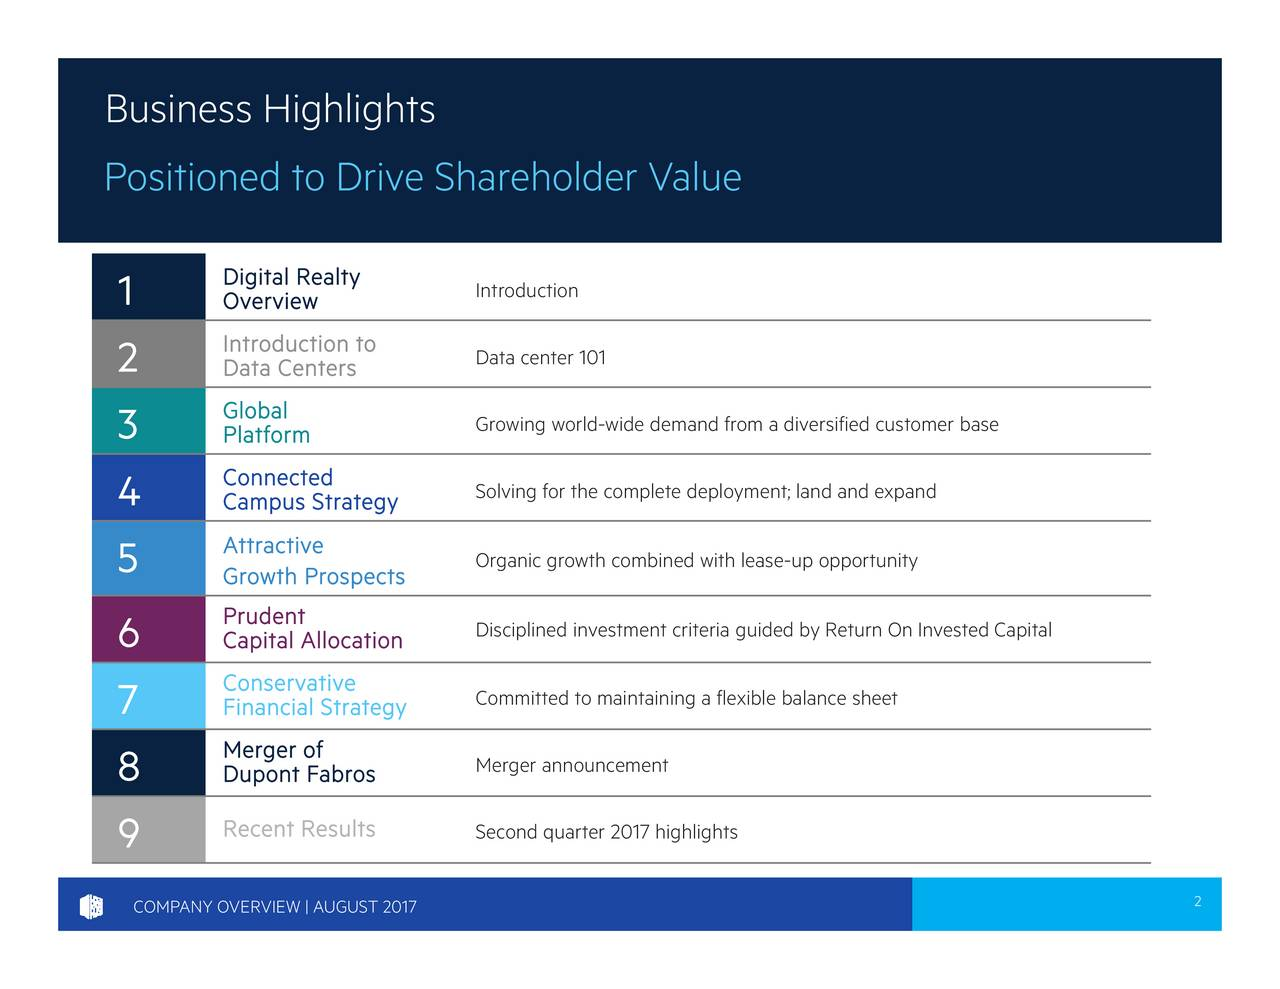 ed by Return On Invested Capital Introdutota ceGerw1n1govrd-woreheimgiowflnddanoymrmfihmcdieaipnbdprlrubi17baahlehsseet DiOiaelniaodtaCloltlCsrnnmepttsacoiveCdyriaoeilsrcaalnpoaRegaynrRsesults COMPANY OVERVIEW | AUGUST 2017 1 2 3 4 5 6 7 8 9 BusinesPositioned to Drive Shareholder Value